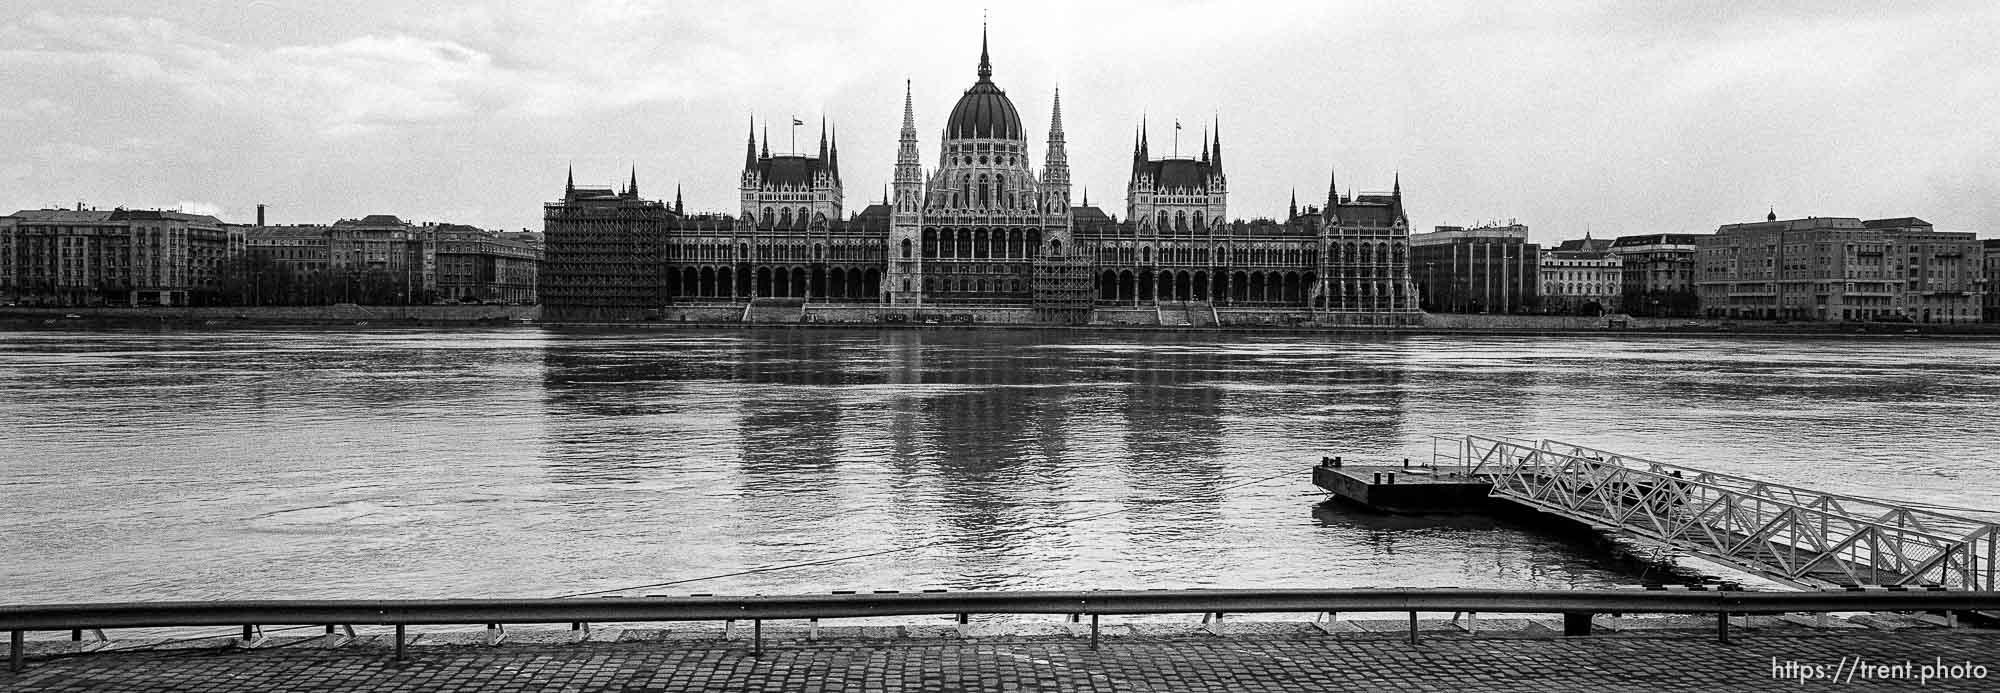 Parliament building across the river.